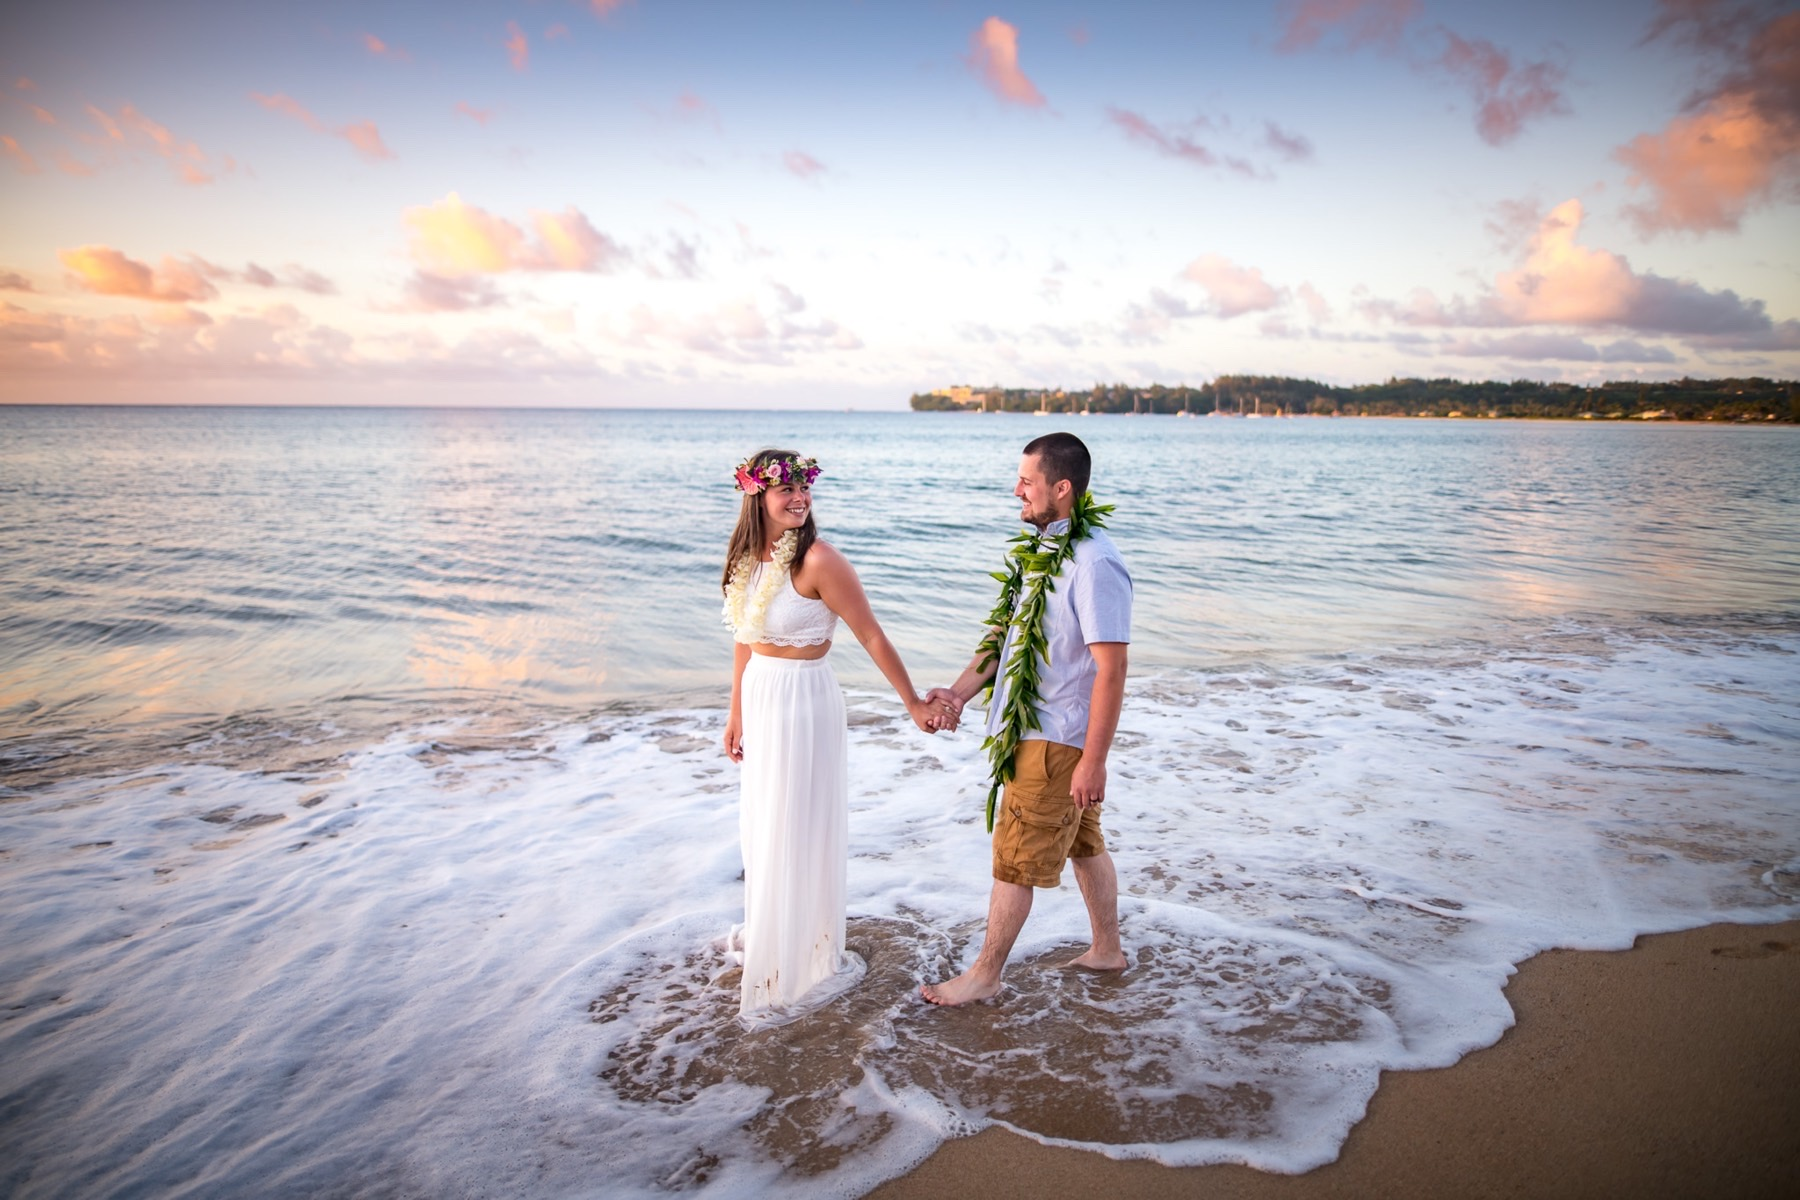 Cherina & Jesse on the beach in Kauai.